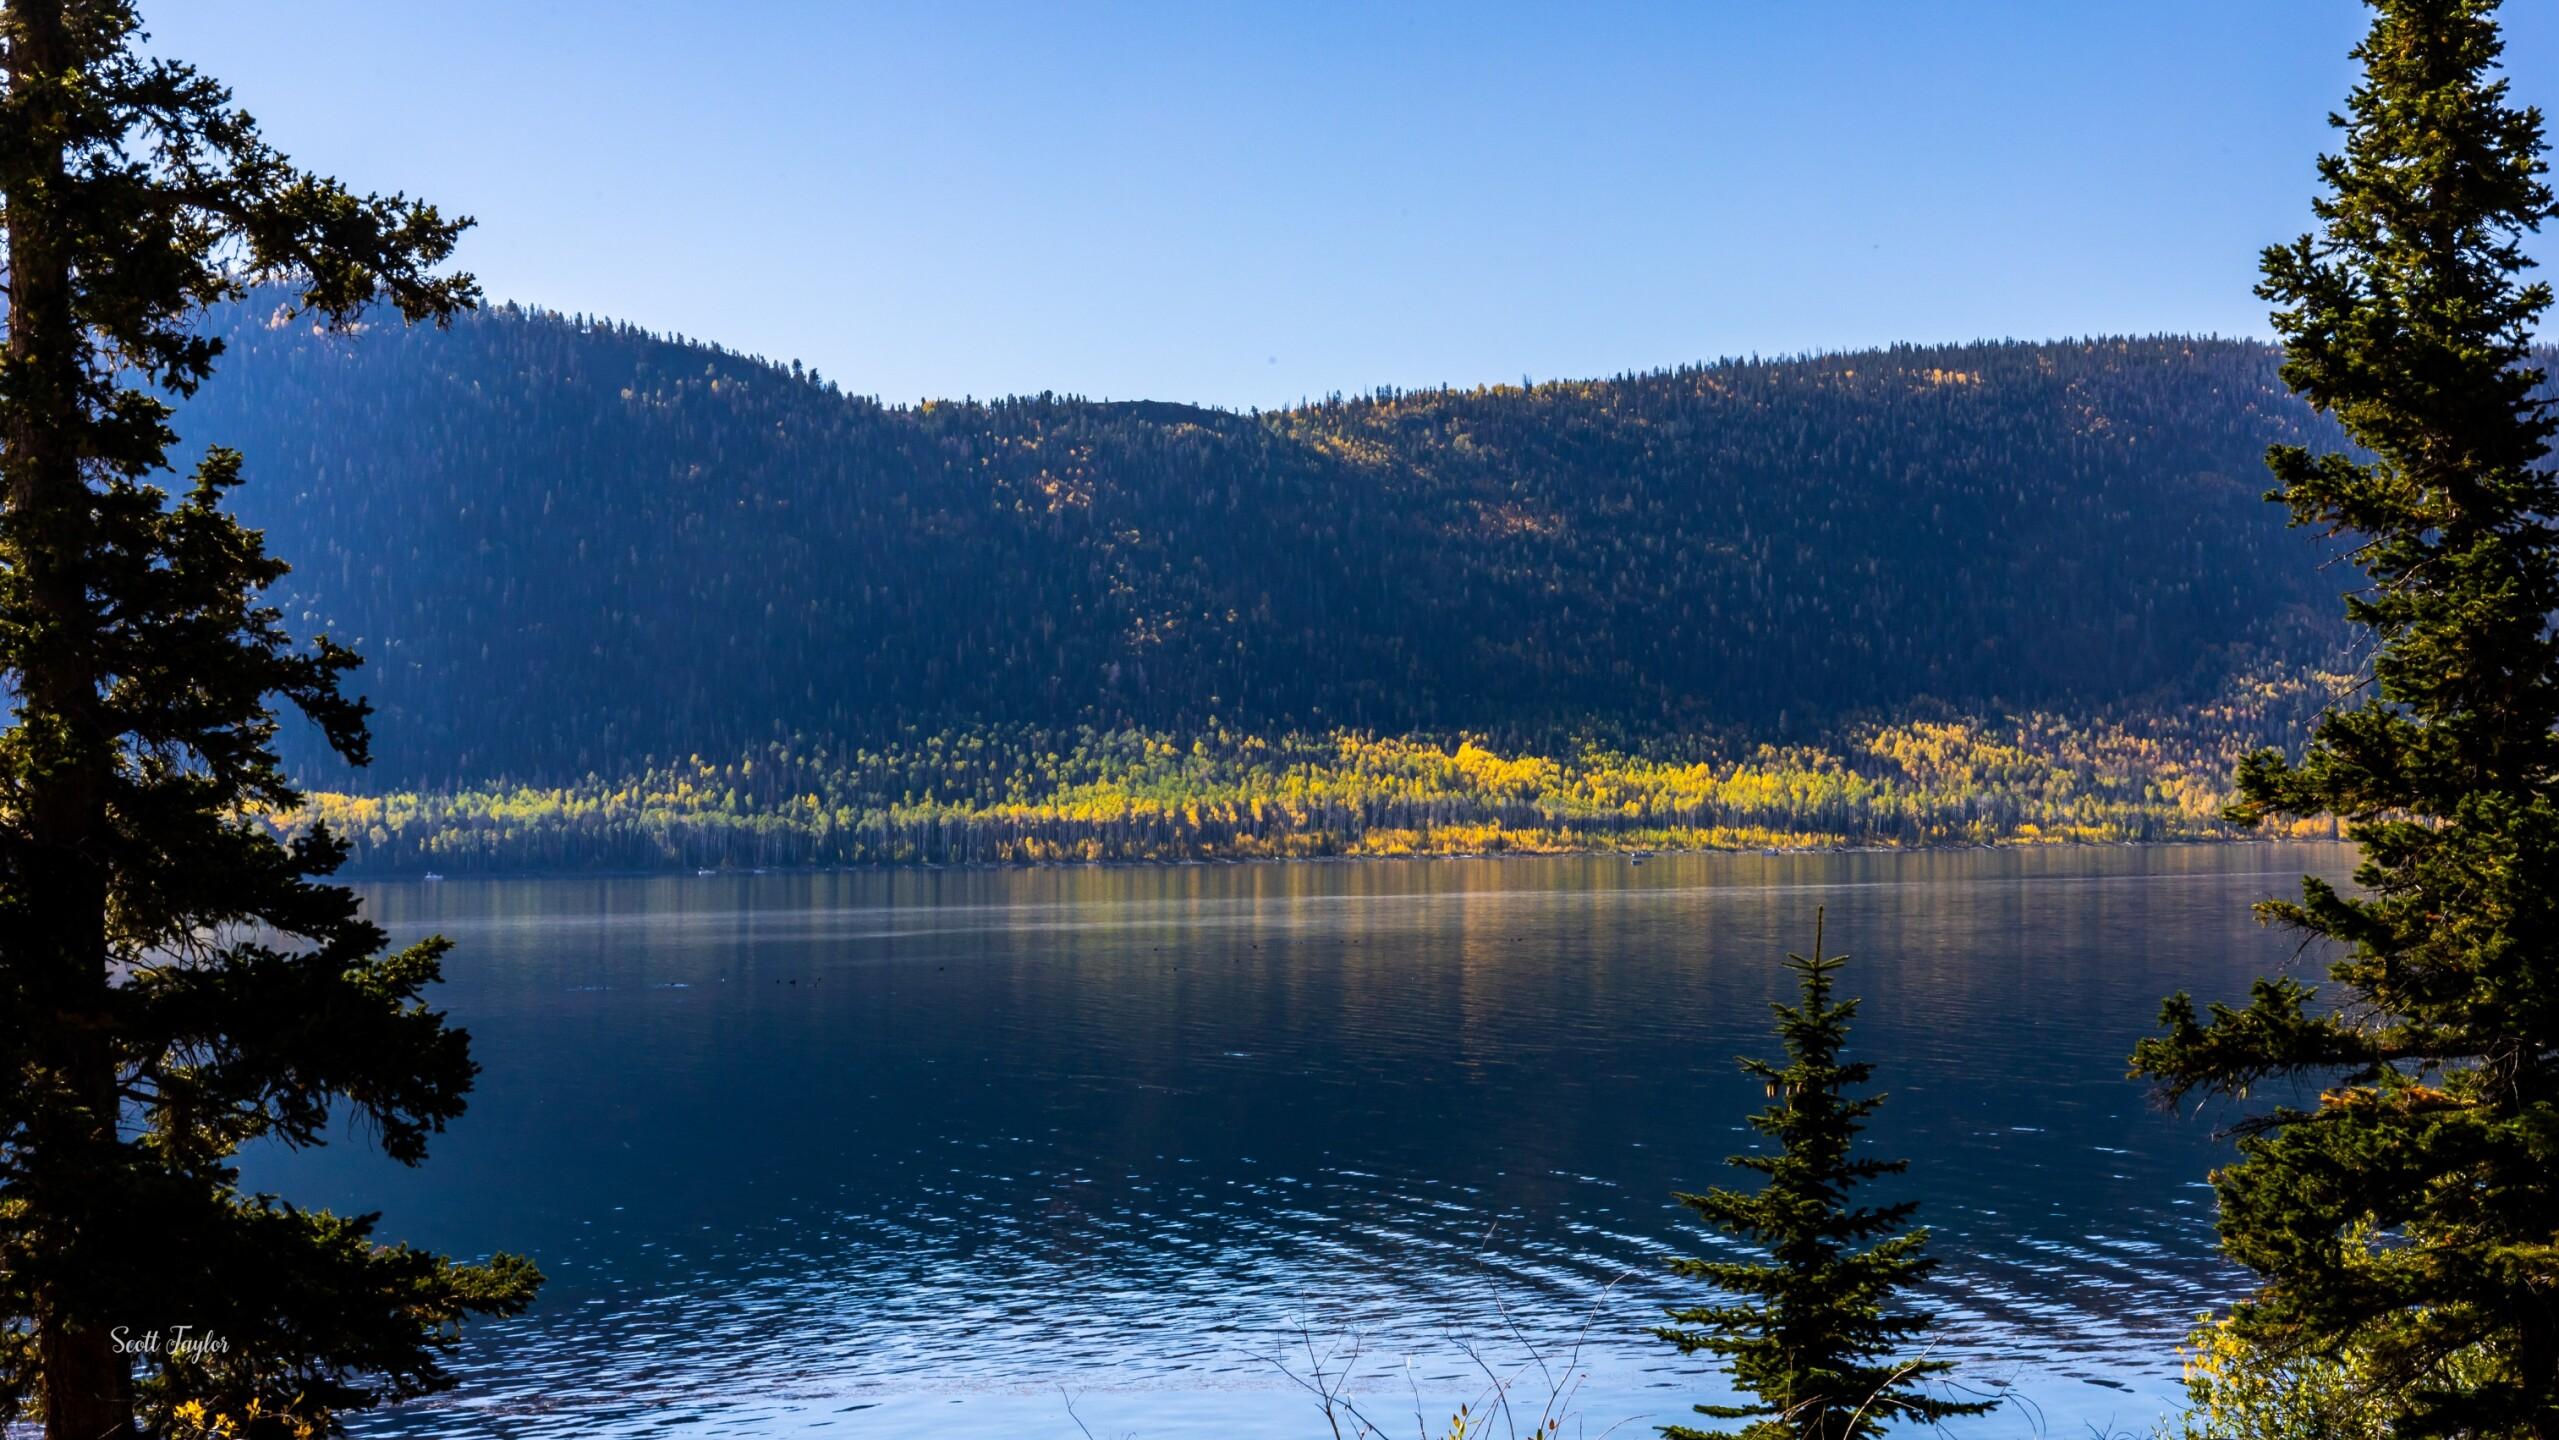 Fish Lake area Scott Taylor (2).jpg